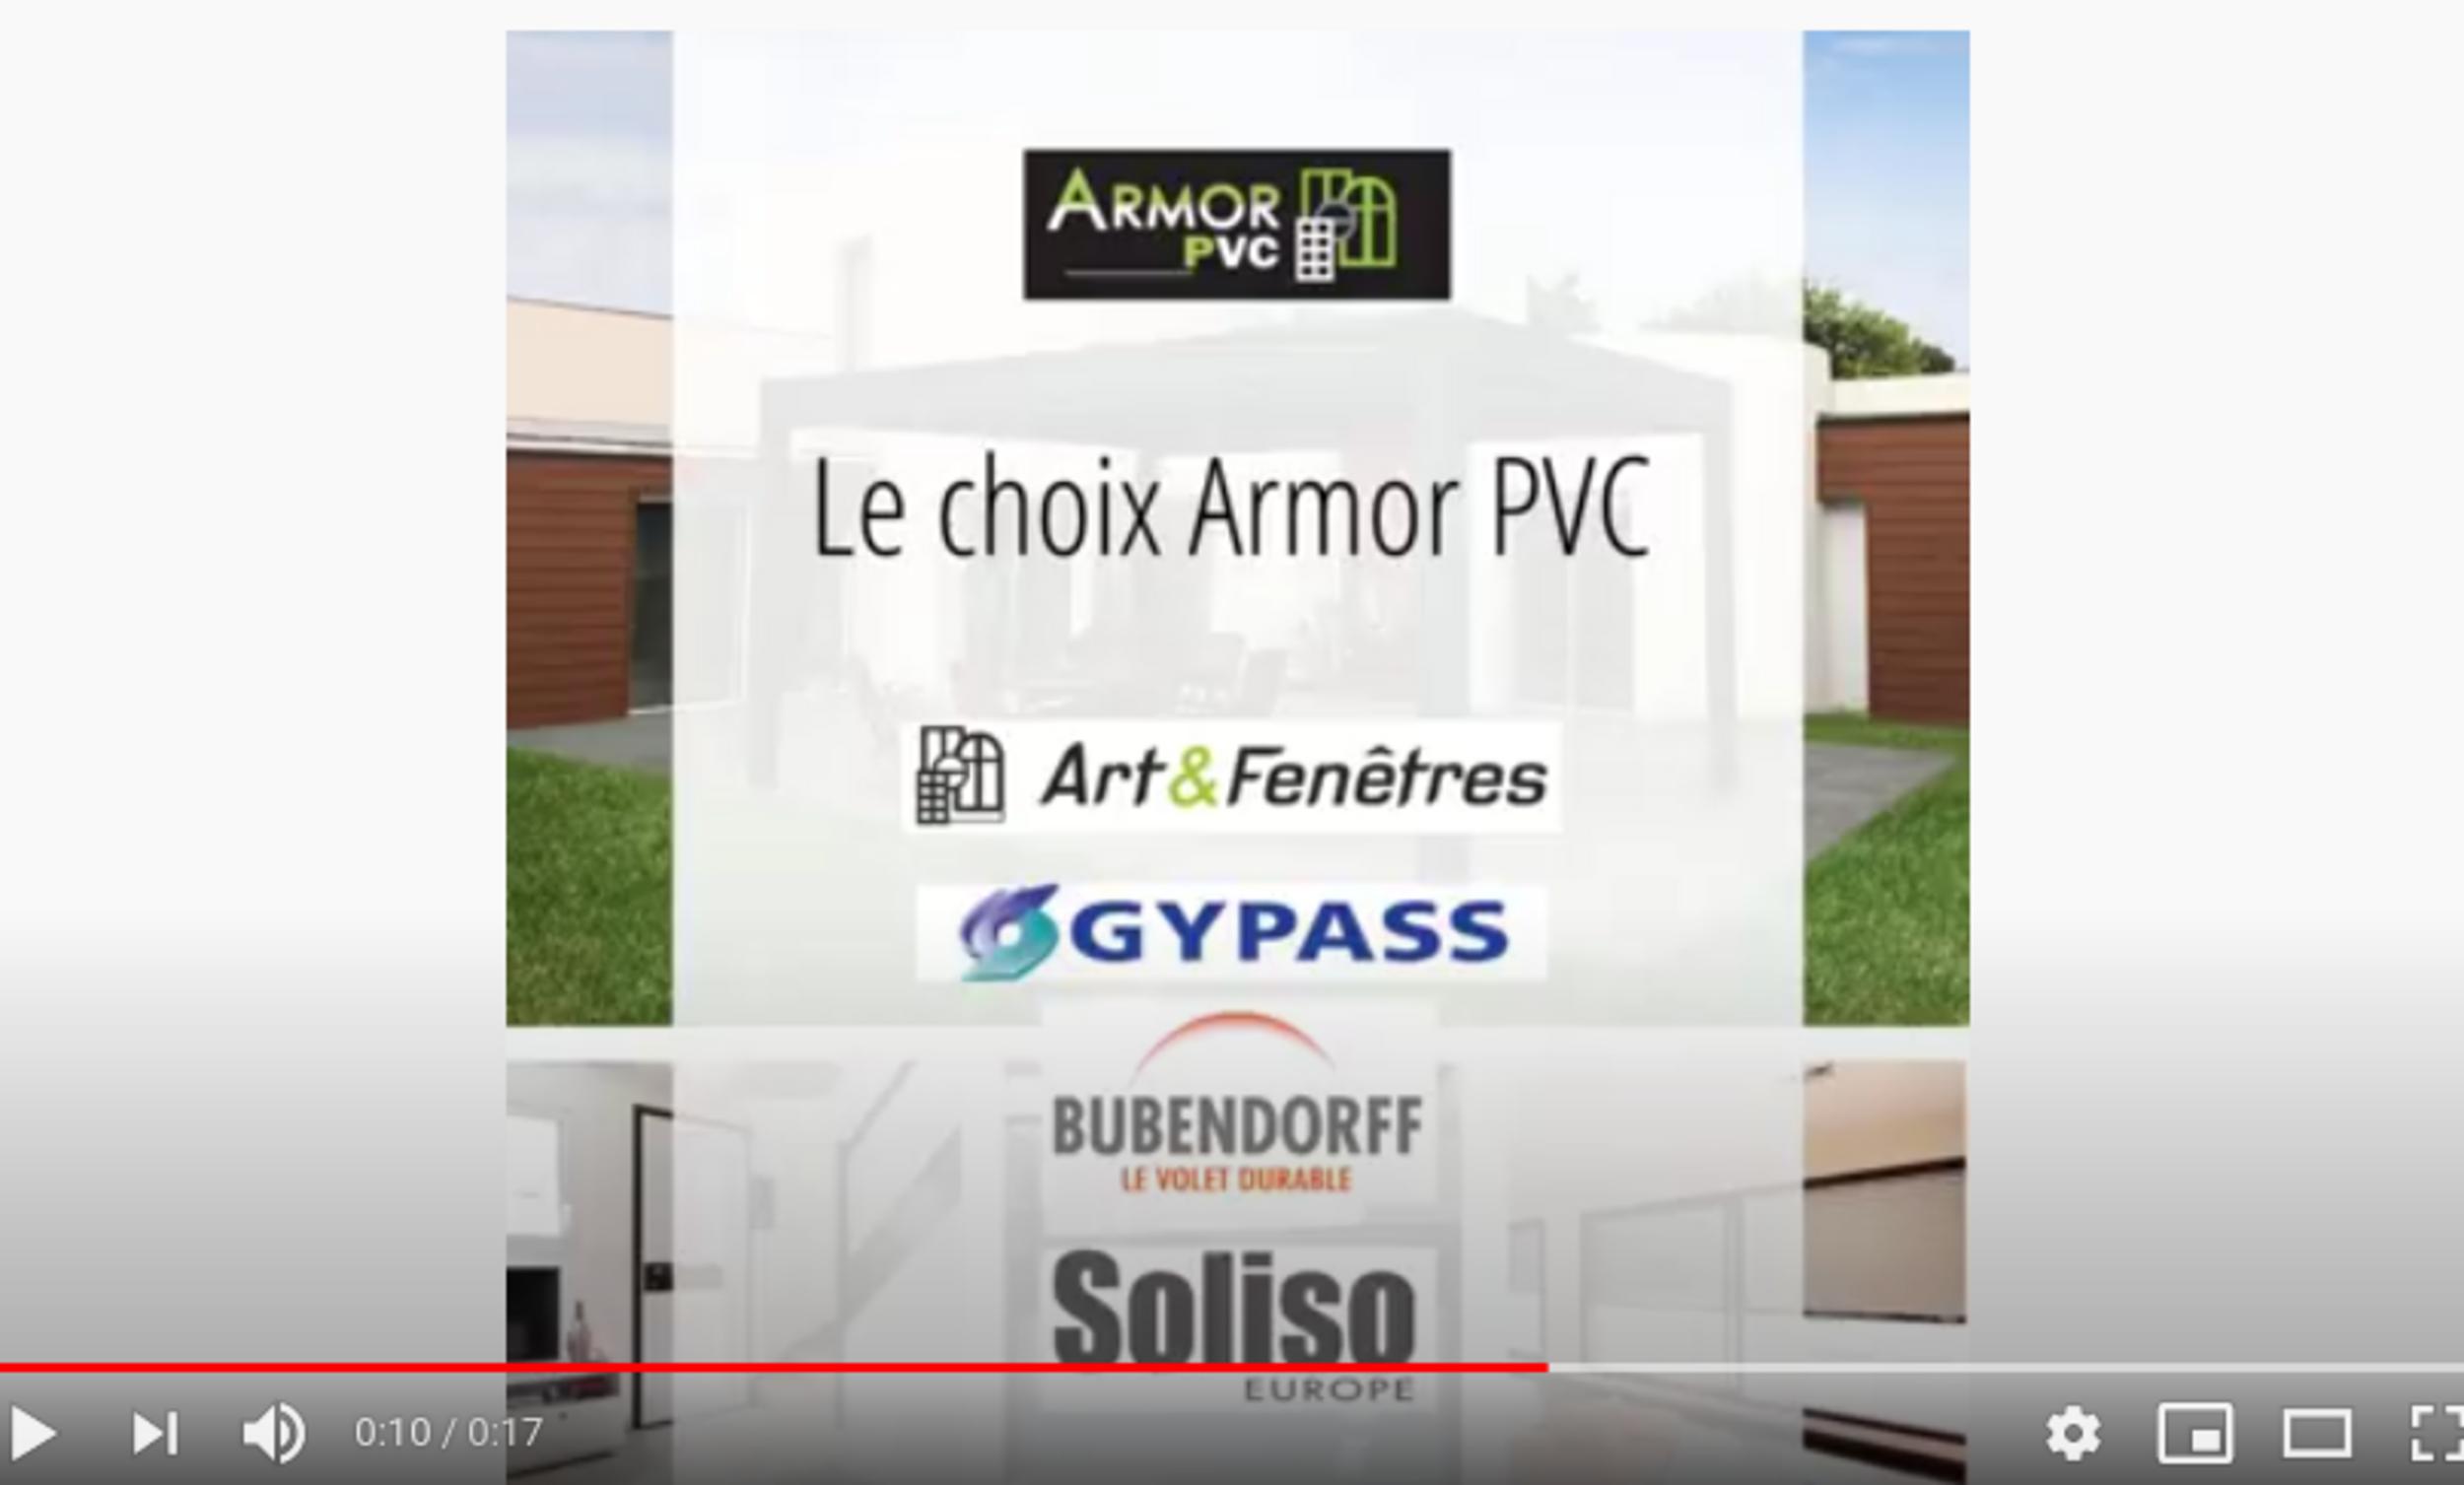 Gypass, Bubendorff, Art & Fenêtres, Soliso